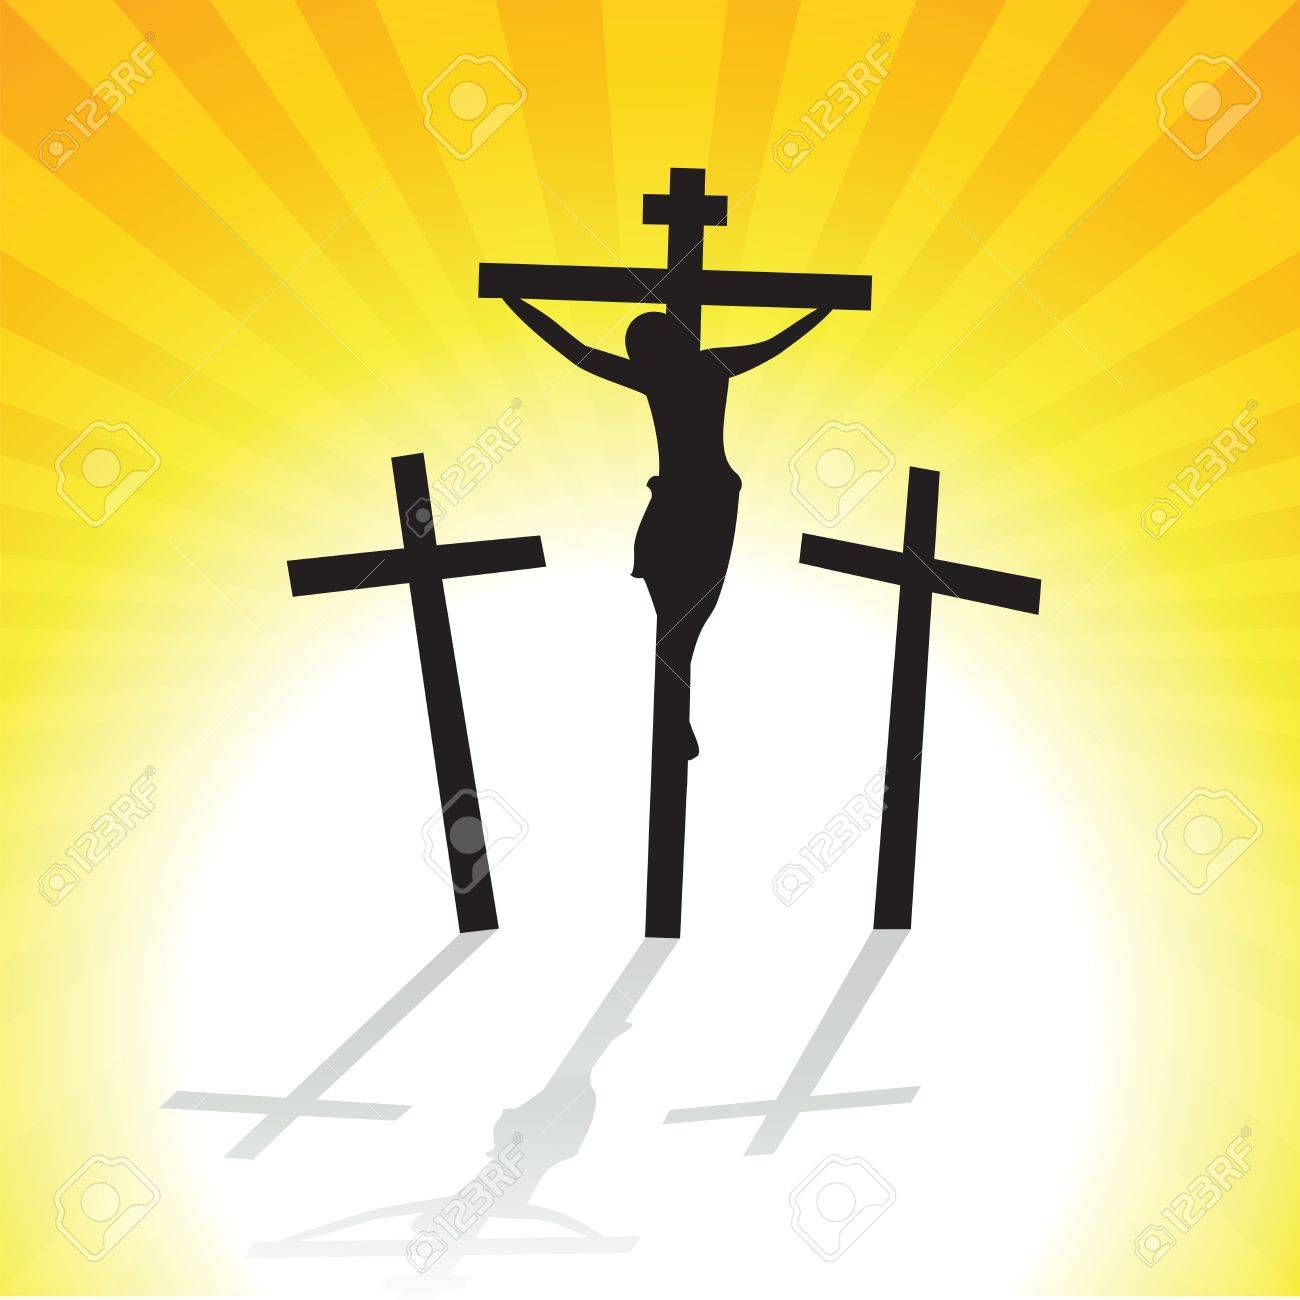 jesus christ crucifixion vector illustration of three crosses